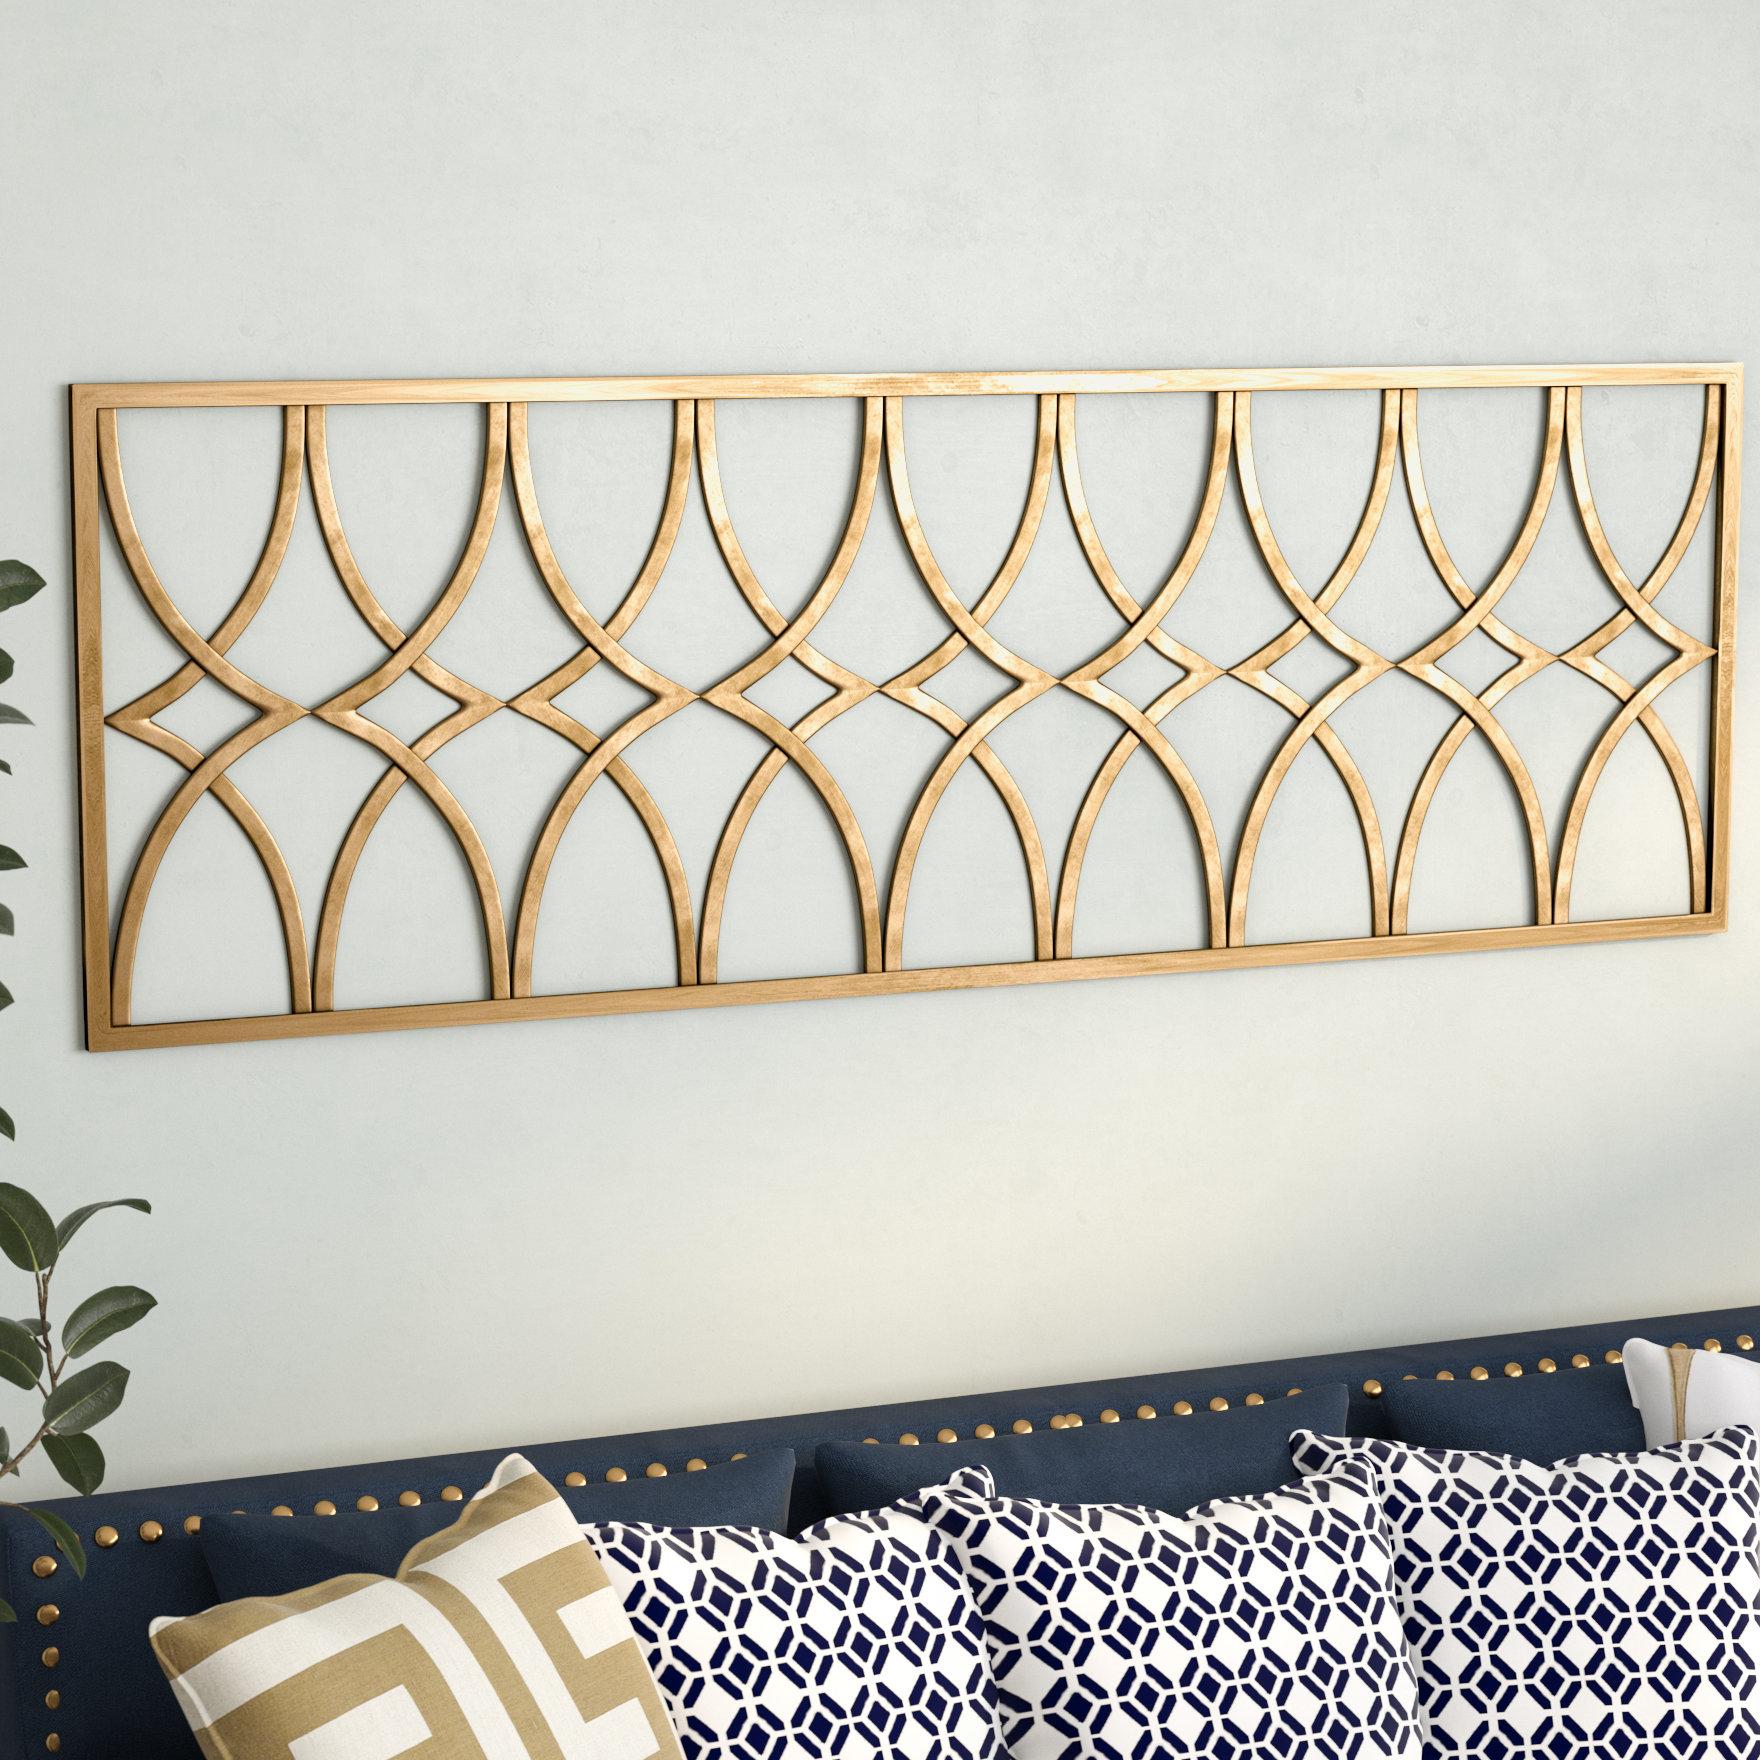 Willa Arlo Interiors Gold Metal Wall Decor | Wayfair For Starburst Wall Decor By Willa Arlo Interiors (View 23 of 30)